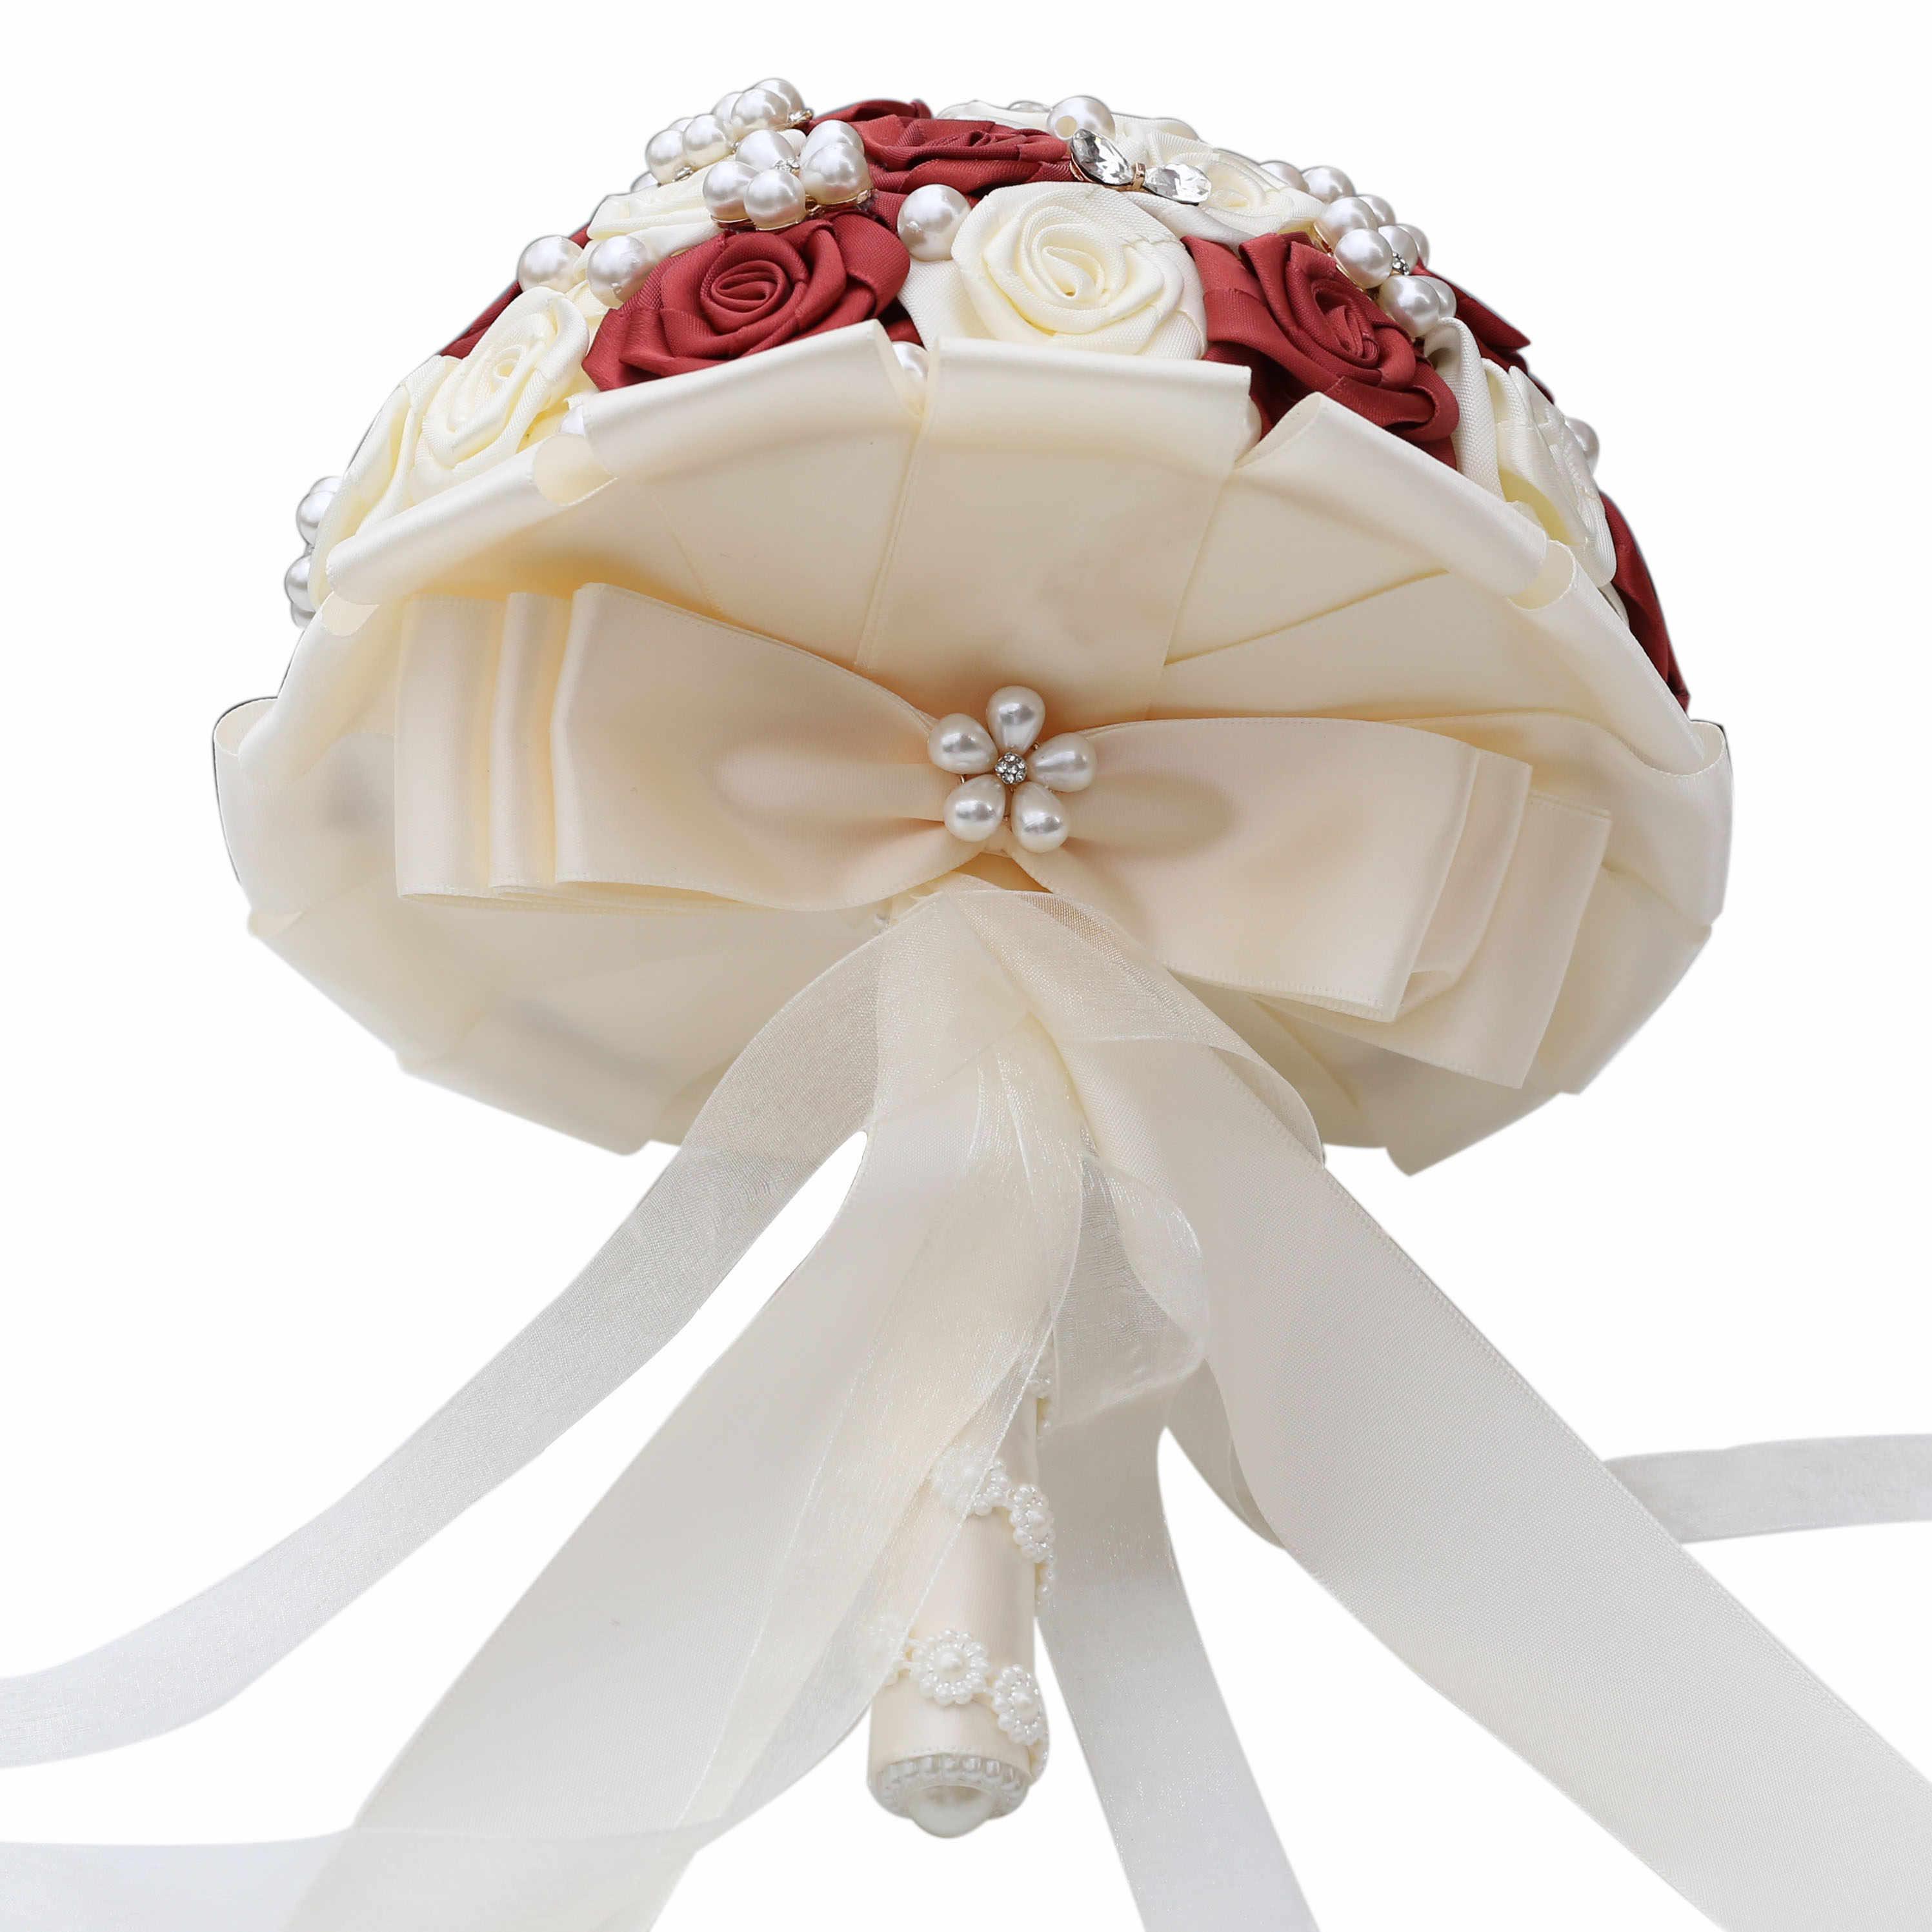 21 Cm Disesuaikan Buatan Mutiara Kristal Pernikahan Karangan Bunga Bridesmaid Tangan Memegang Bunga Sutra Pita Pengantin Pernikahan Bouquet W128